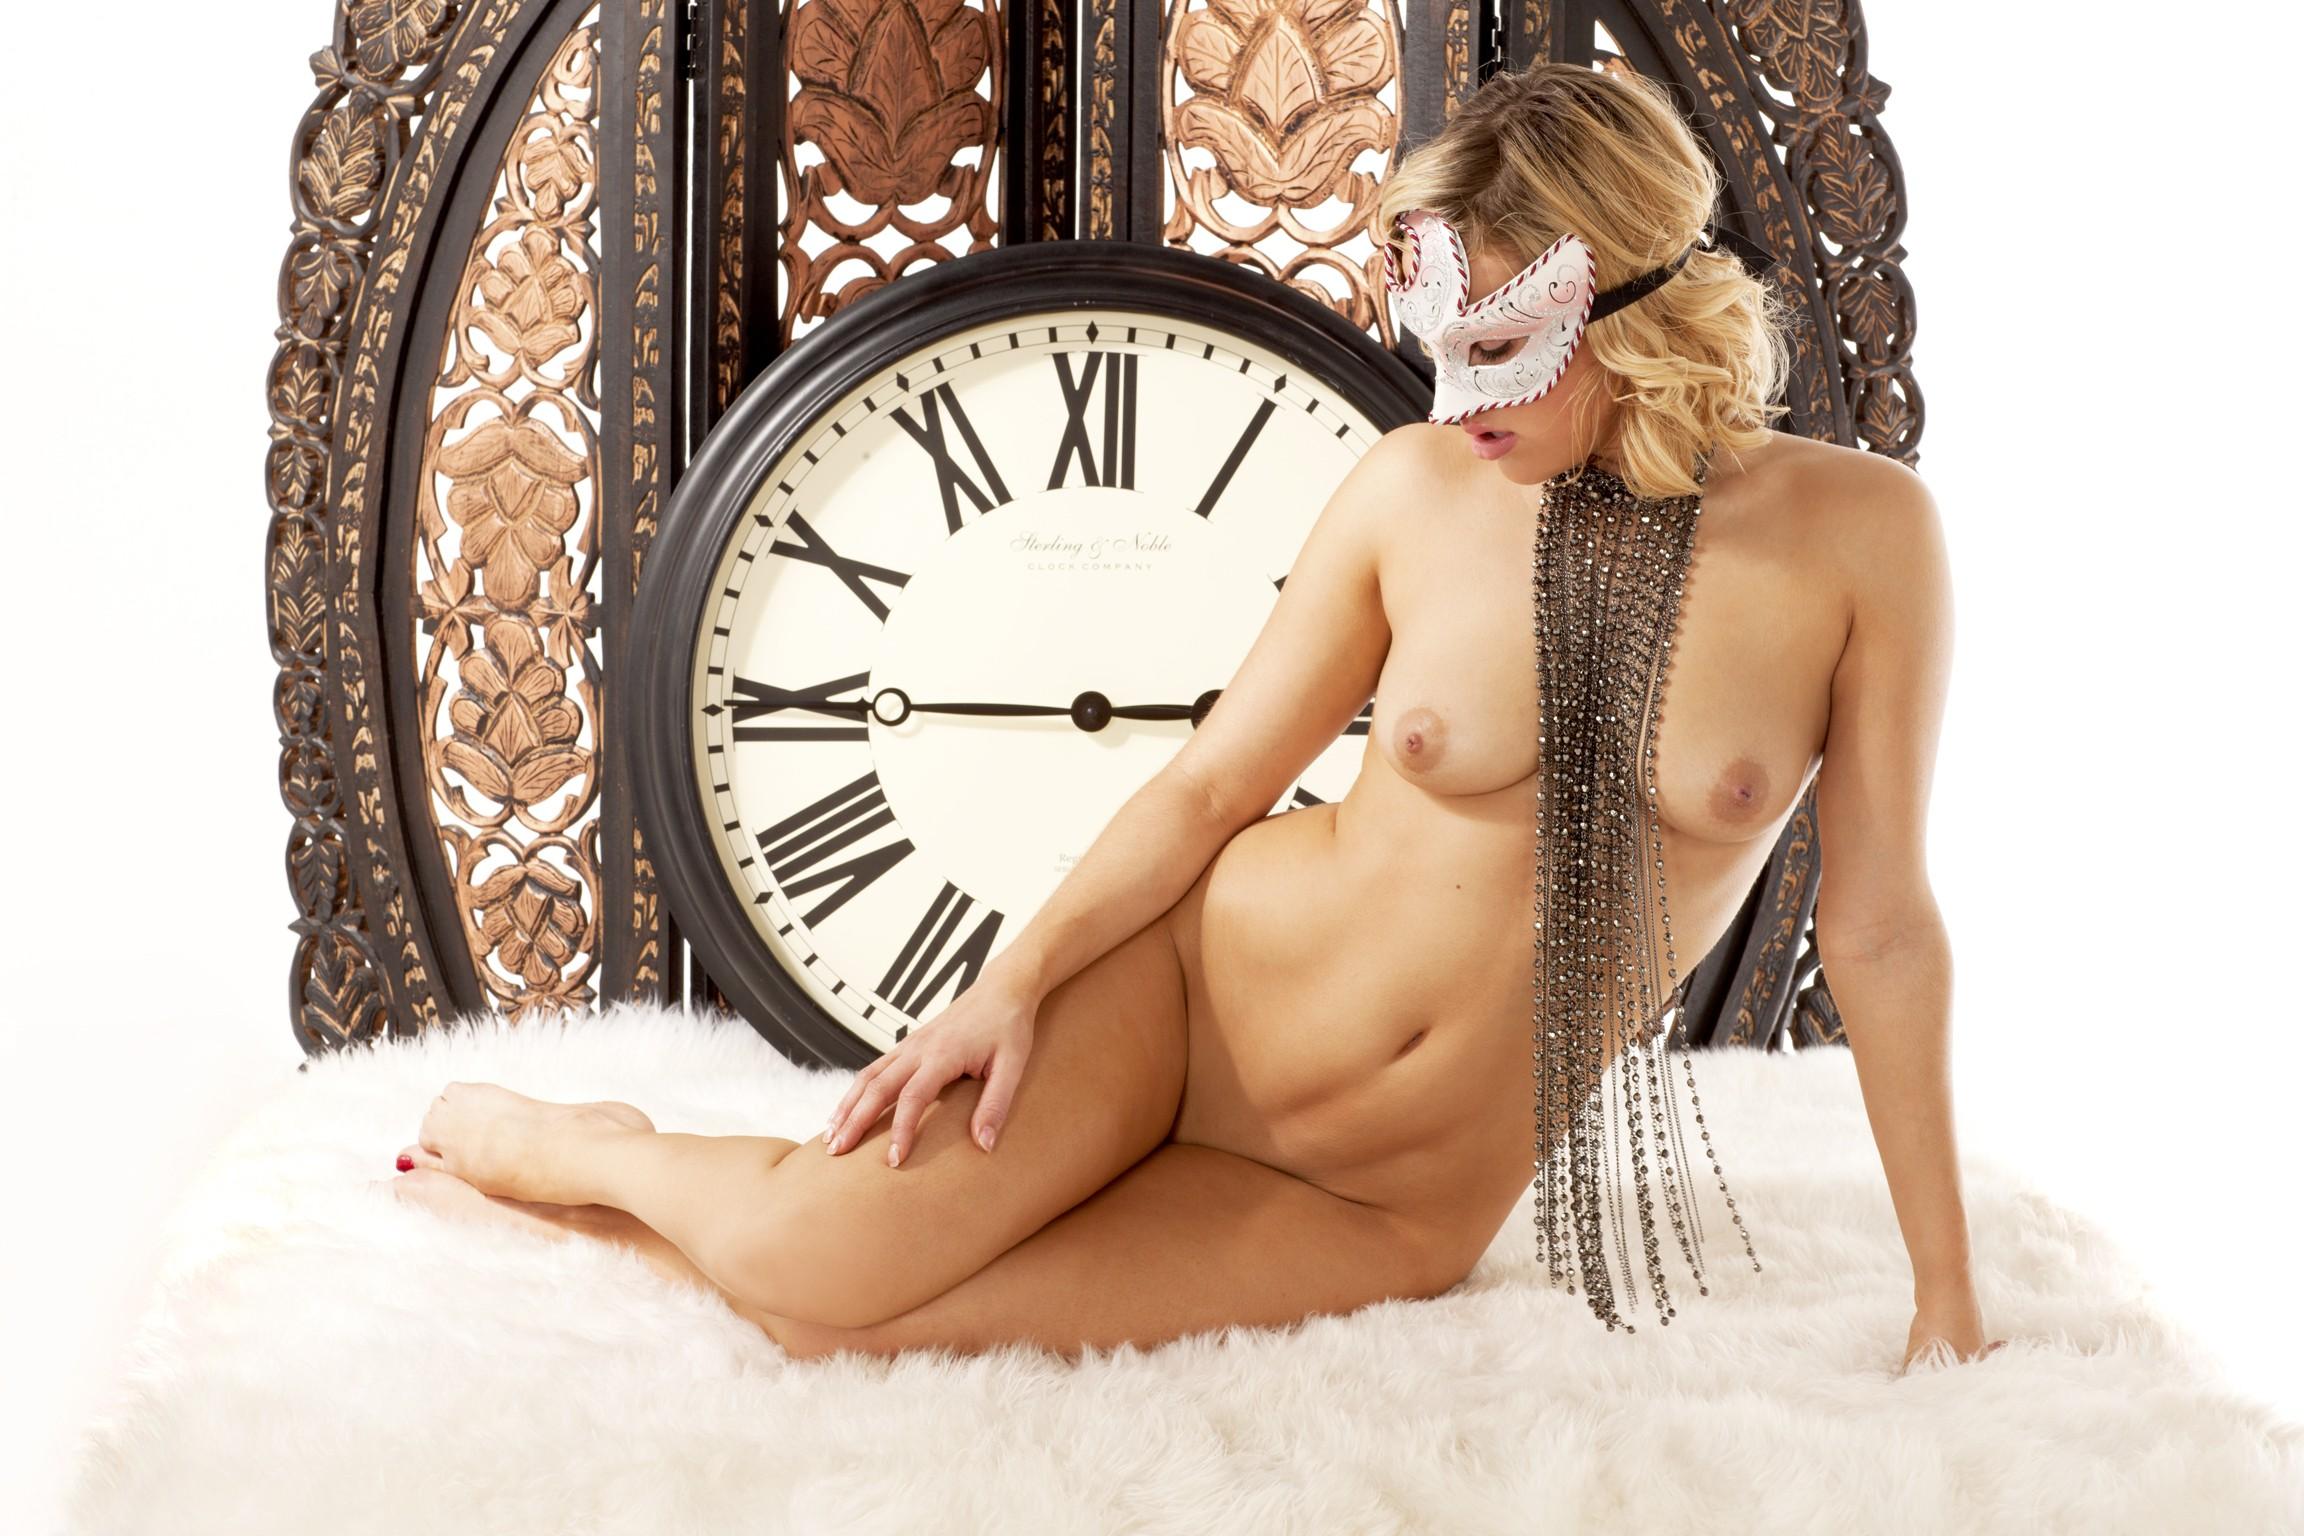 wwe-renee-sexy-pic-classic-lesbian-porn